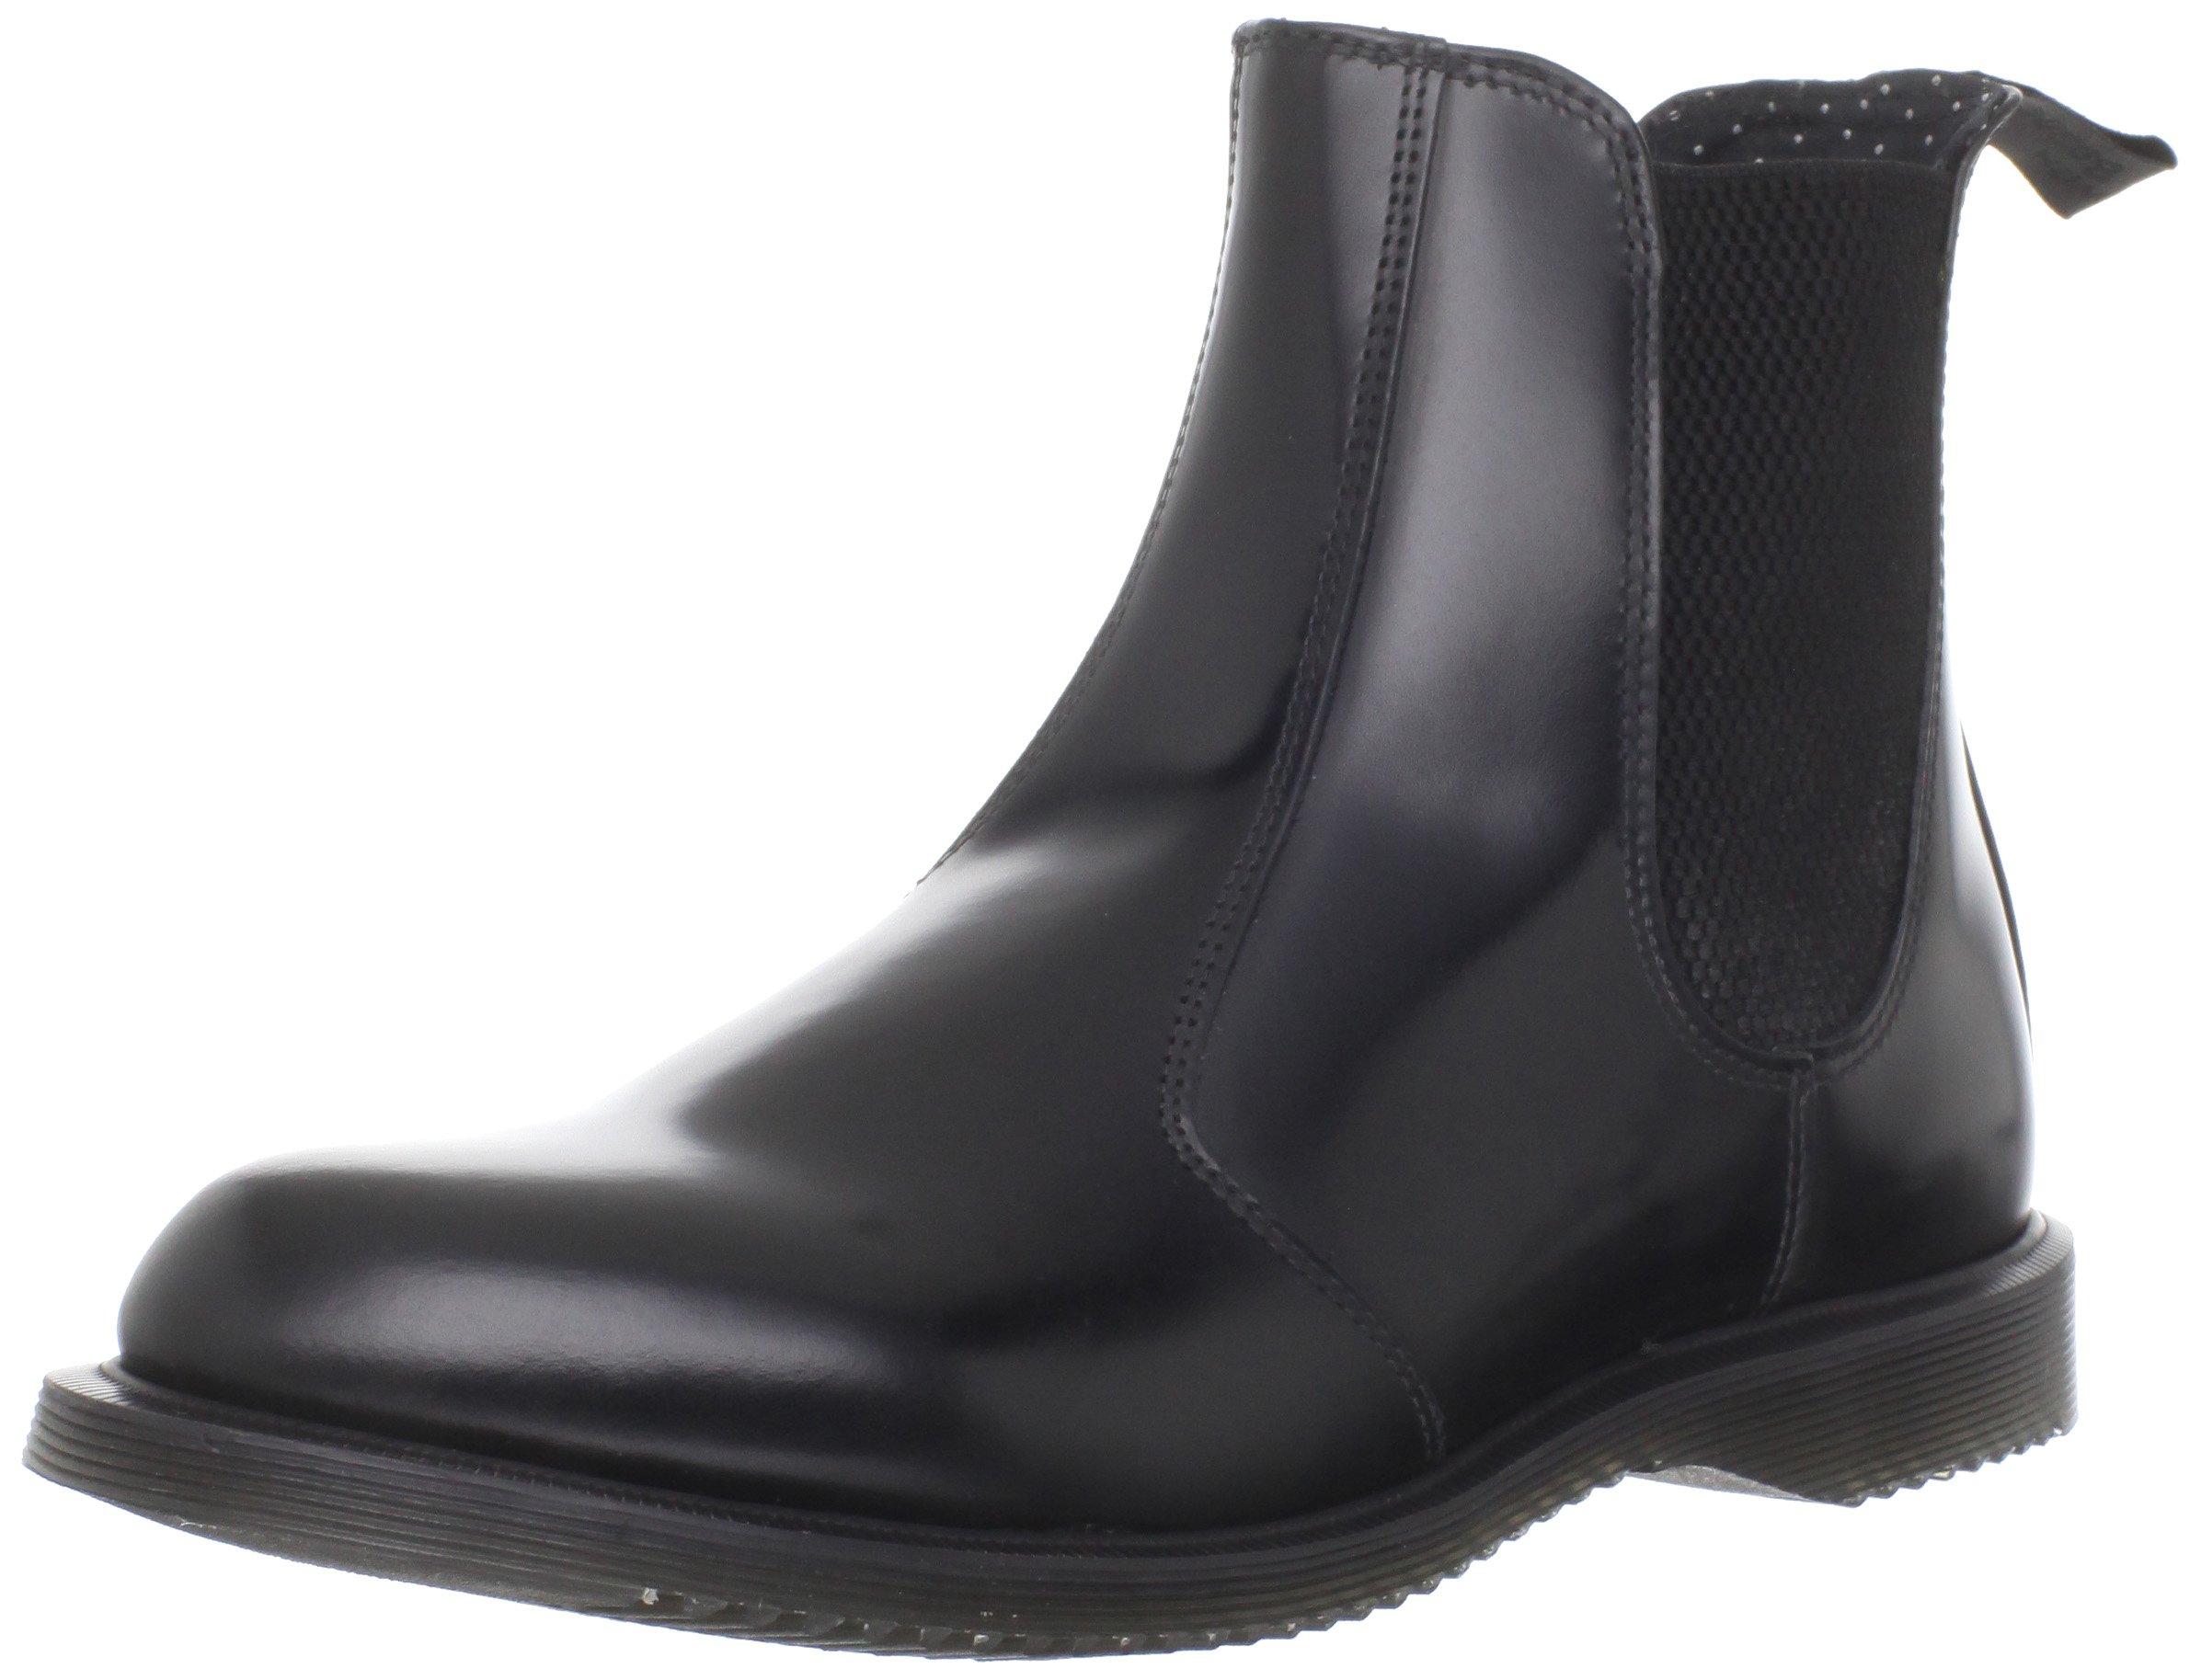 Dr. Martens Women's Leather Flora Chelsea Boot, Black, 5 UK/7 US by Dr. Martens